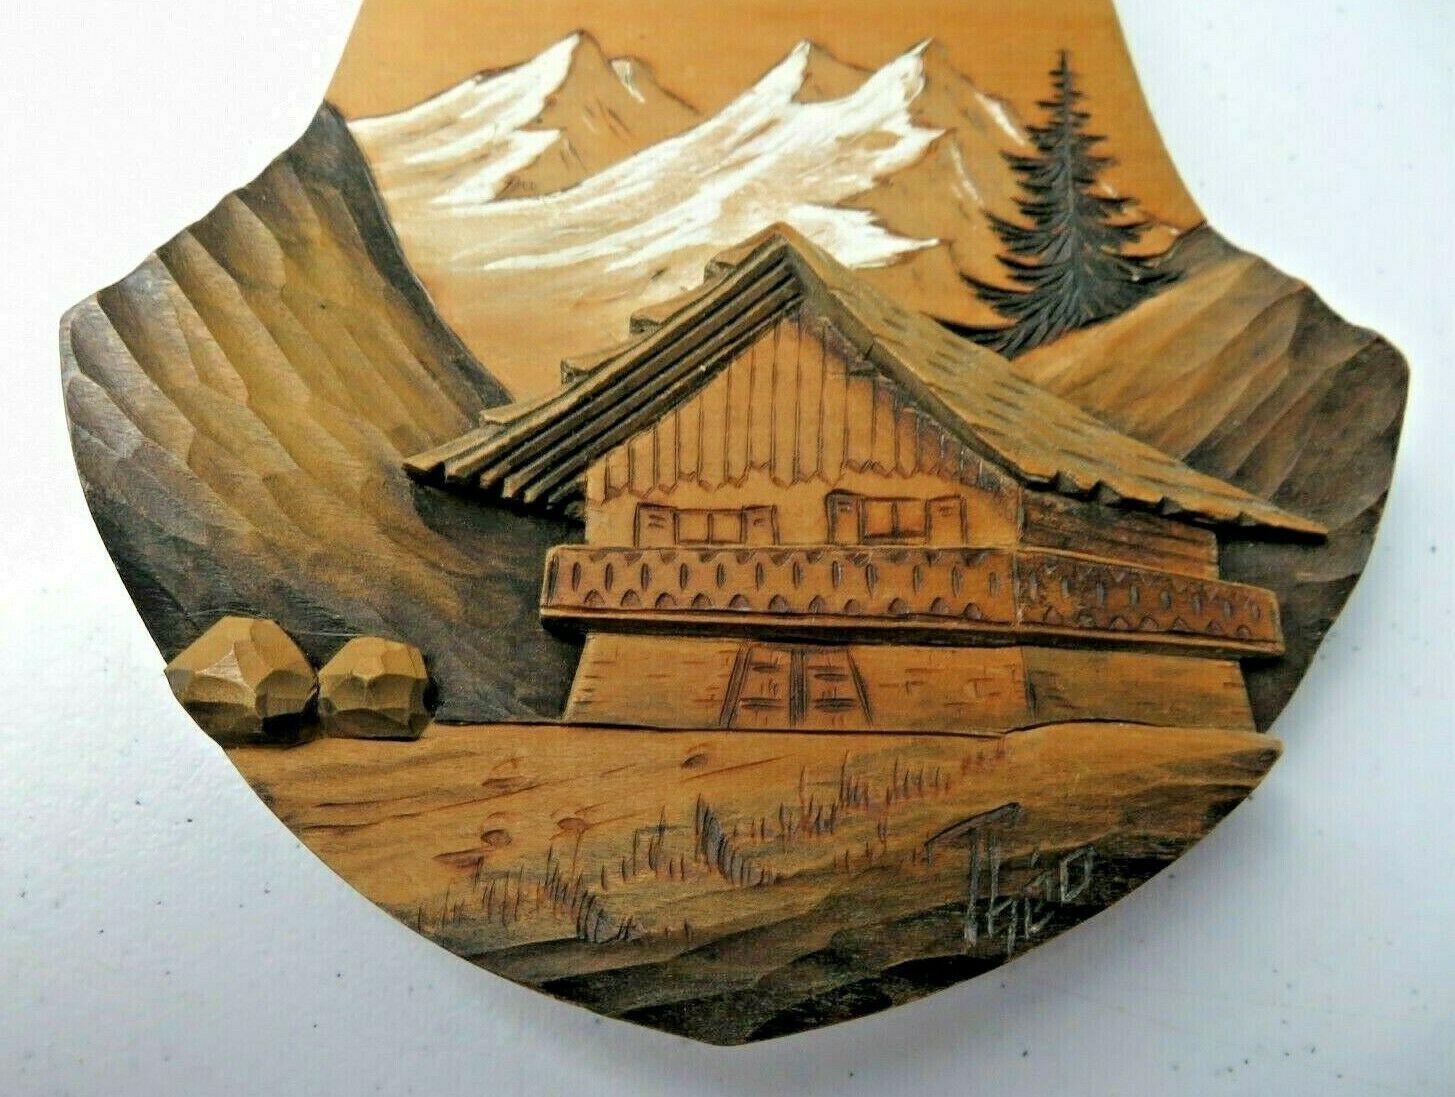 Rare Vintage Swiss or German Wood Wall Sculpture Handpainted signed Barometer